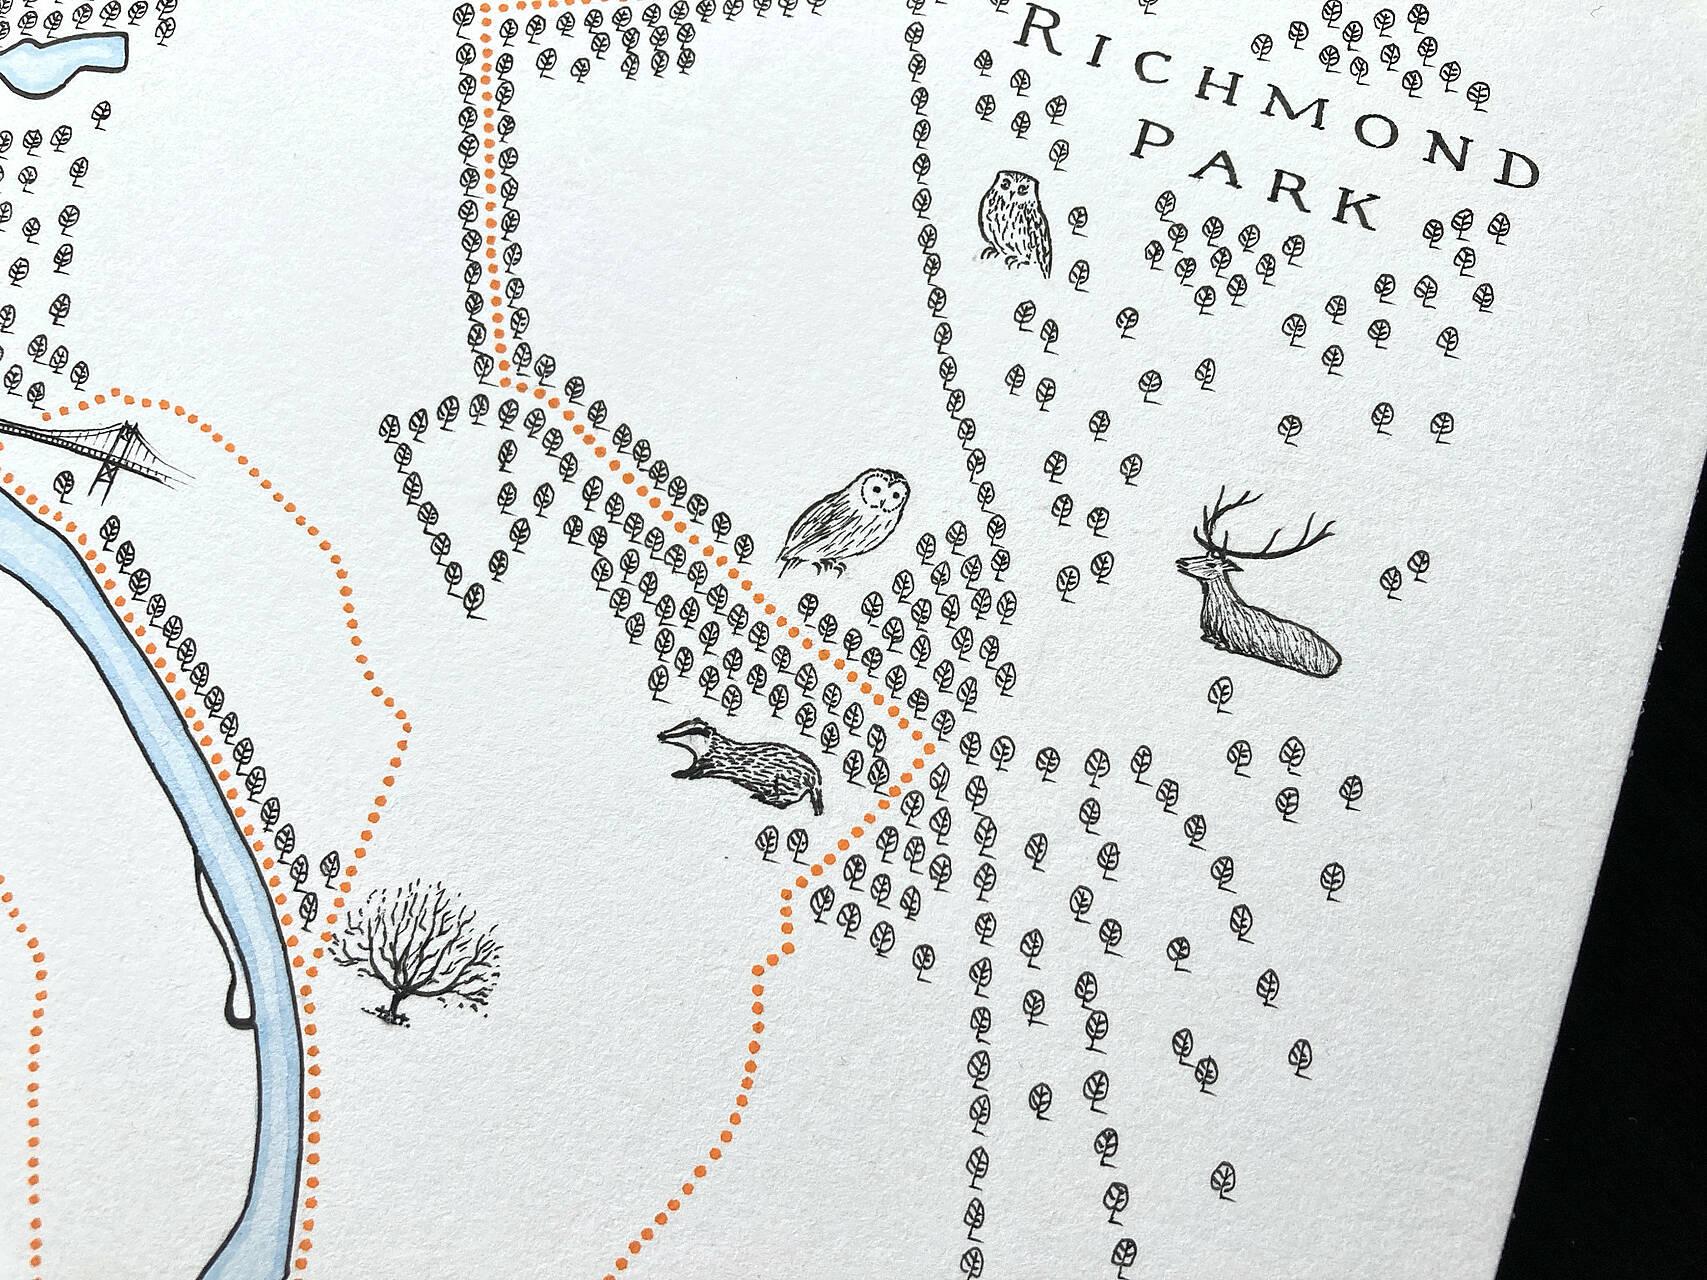 commission -Kingston, Richmond, Bushy and the River -Ben -zoom 4.jpg